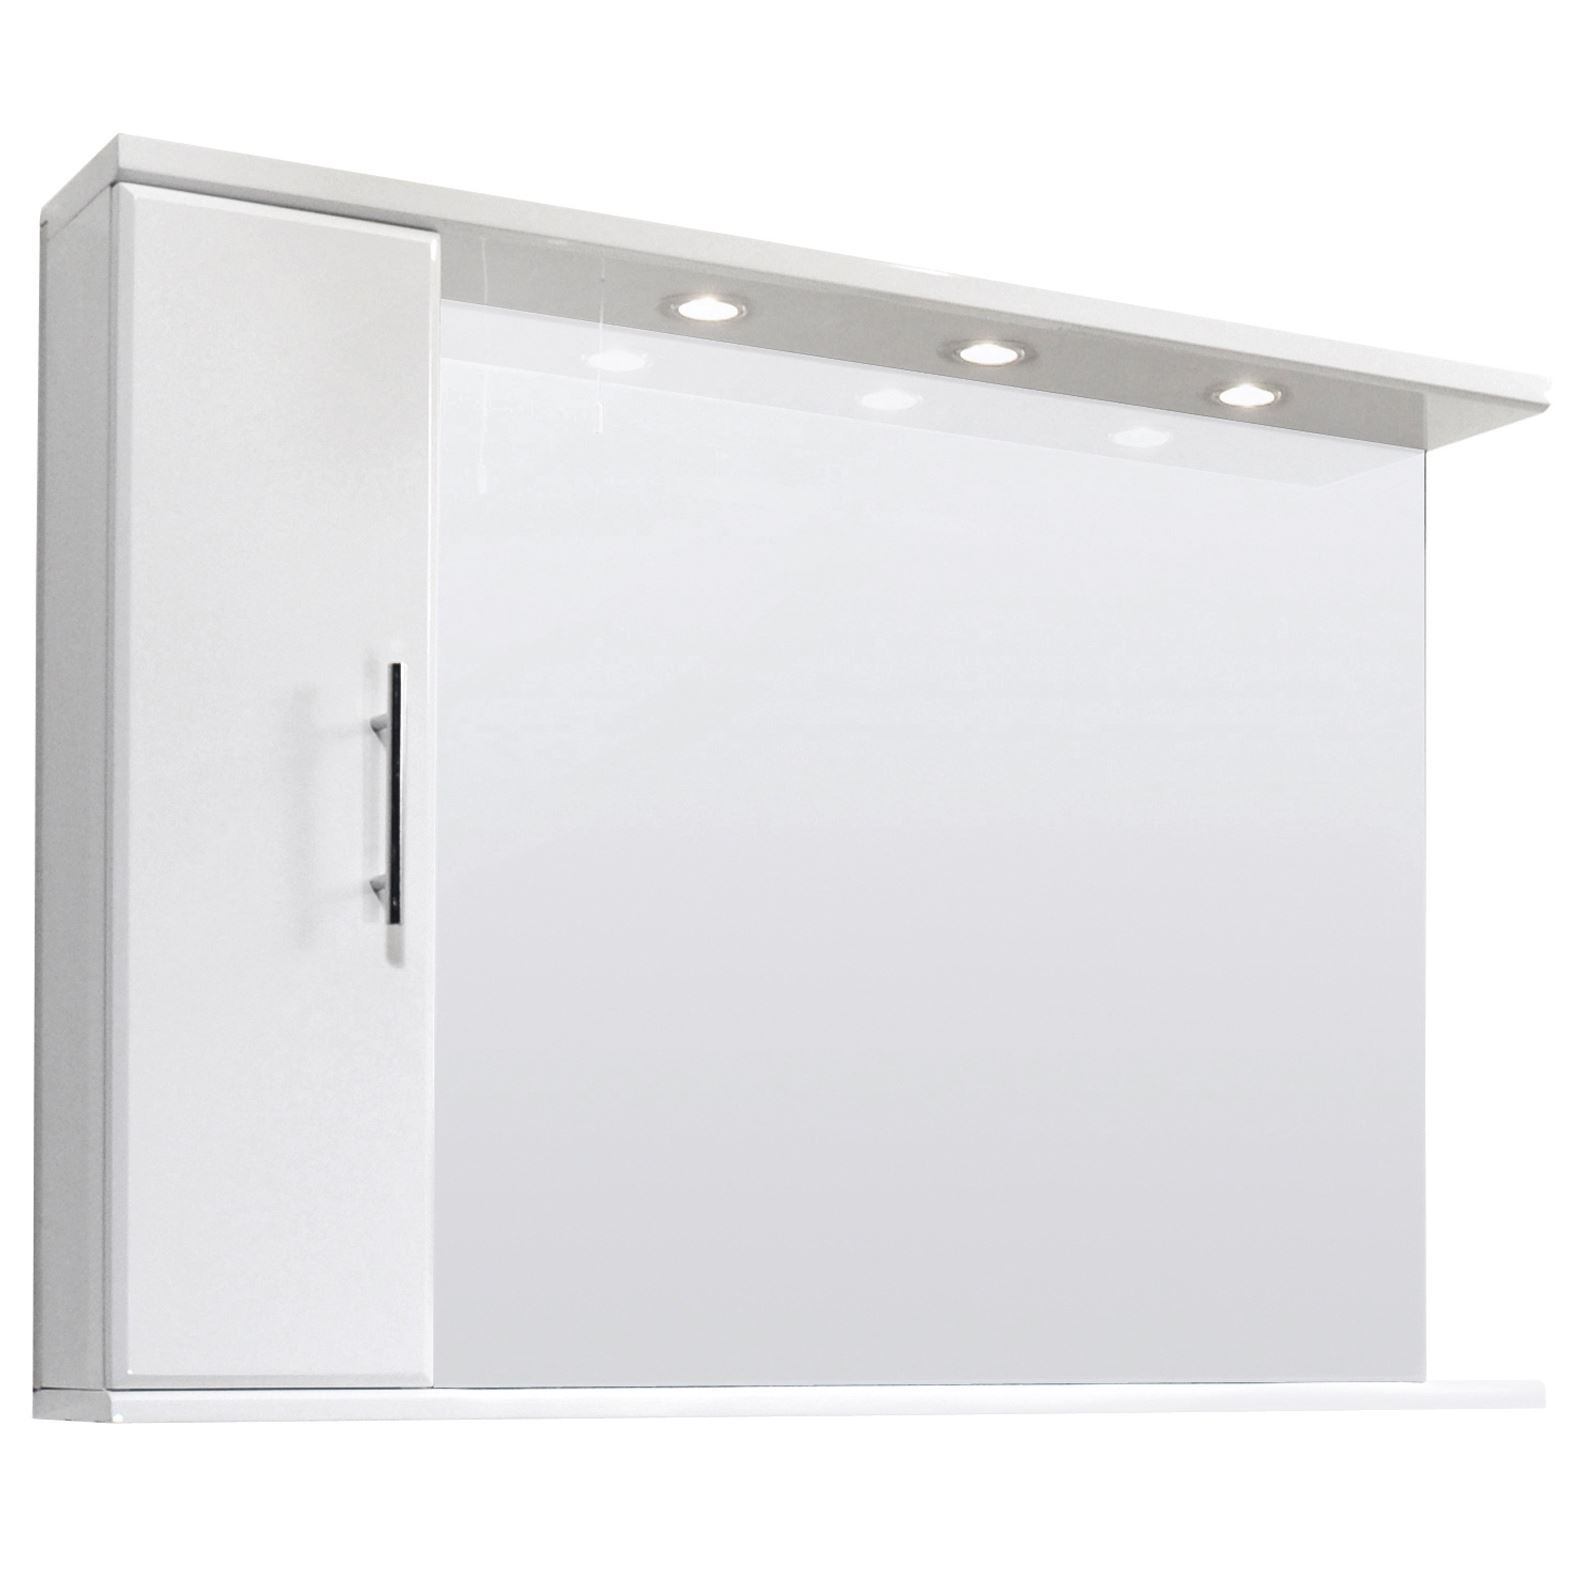 high gloss white bathroom mirror vanity cabinet inset light shelf